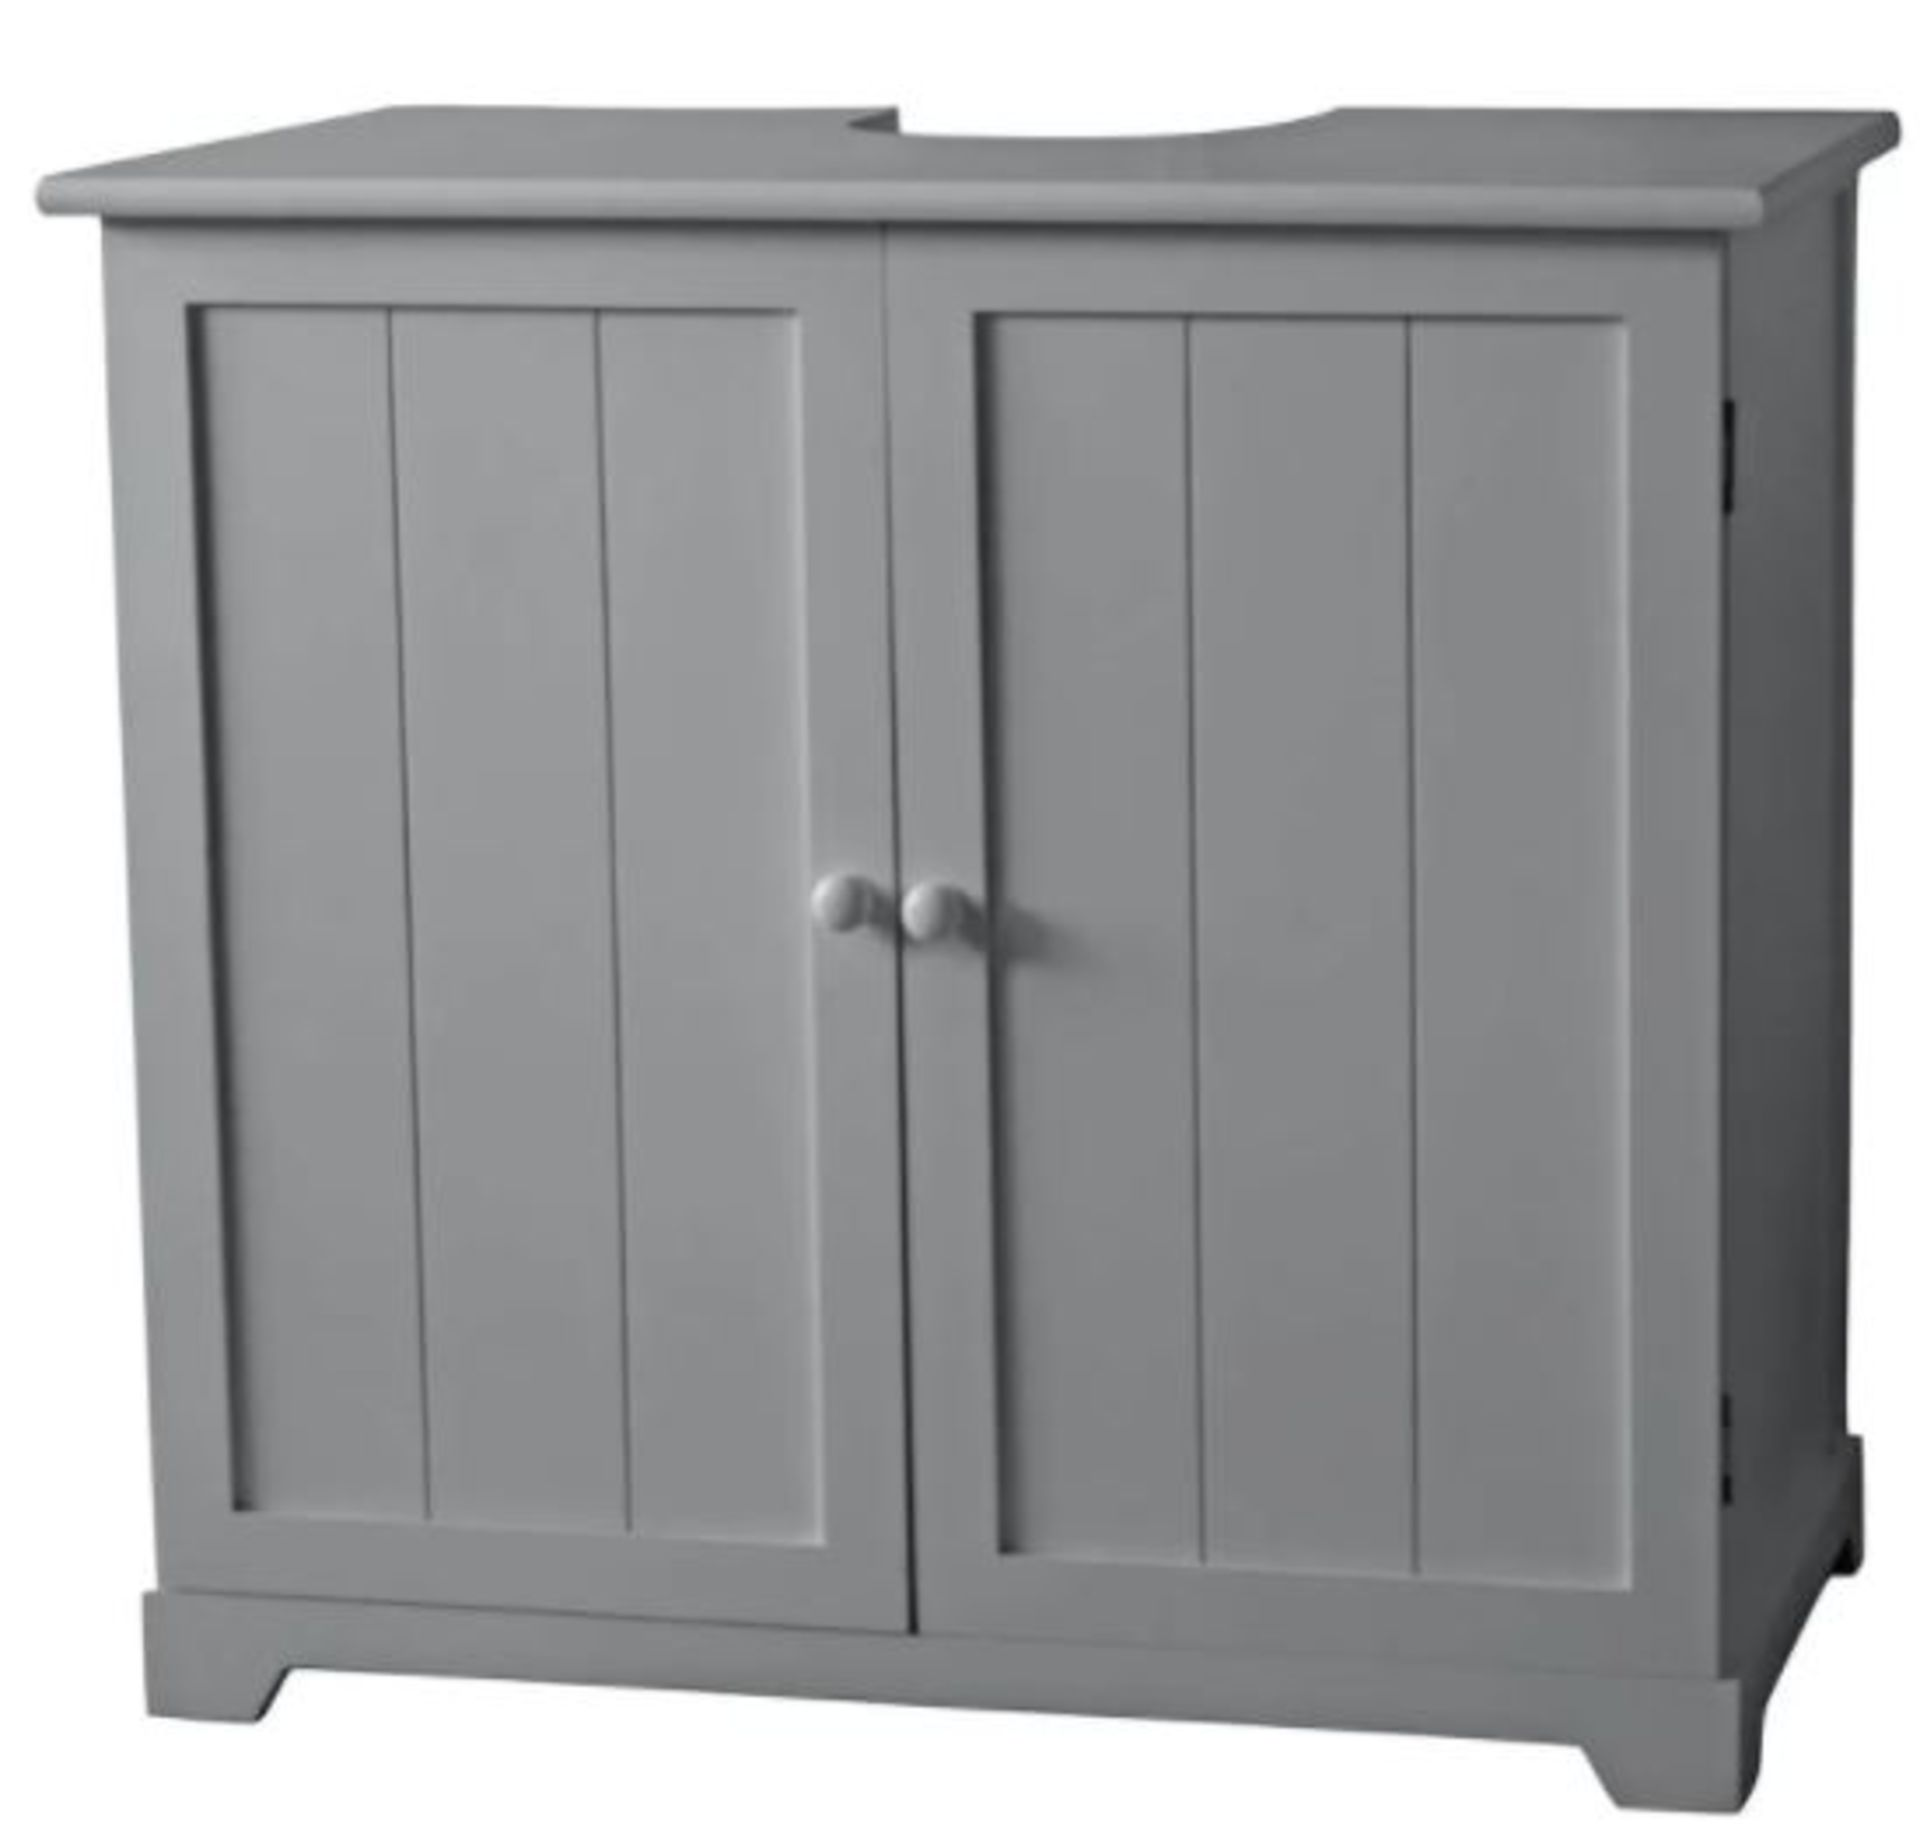 (P6) 1x Grey Classic Under Sink Double Unit RRP £65. Paulownia Wood. Grey Painted Finish. 2x Doors